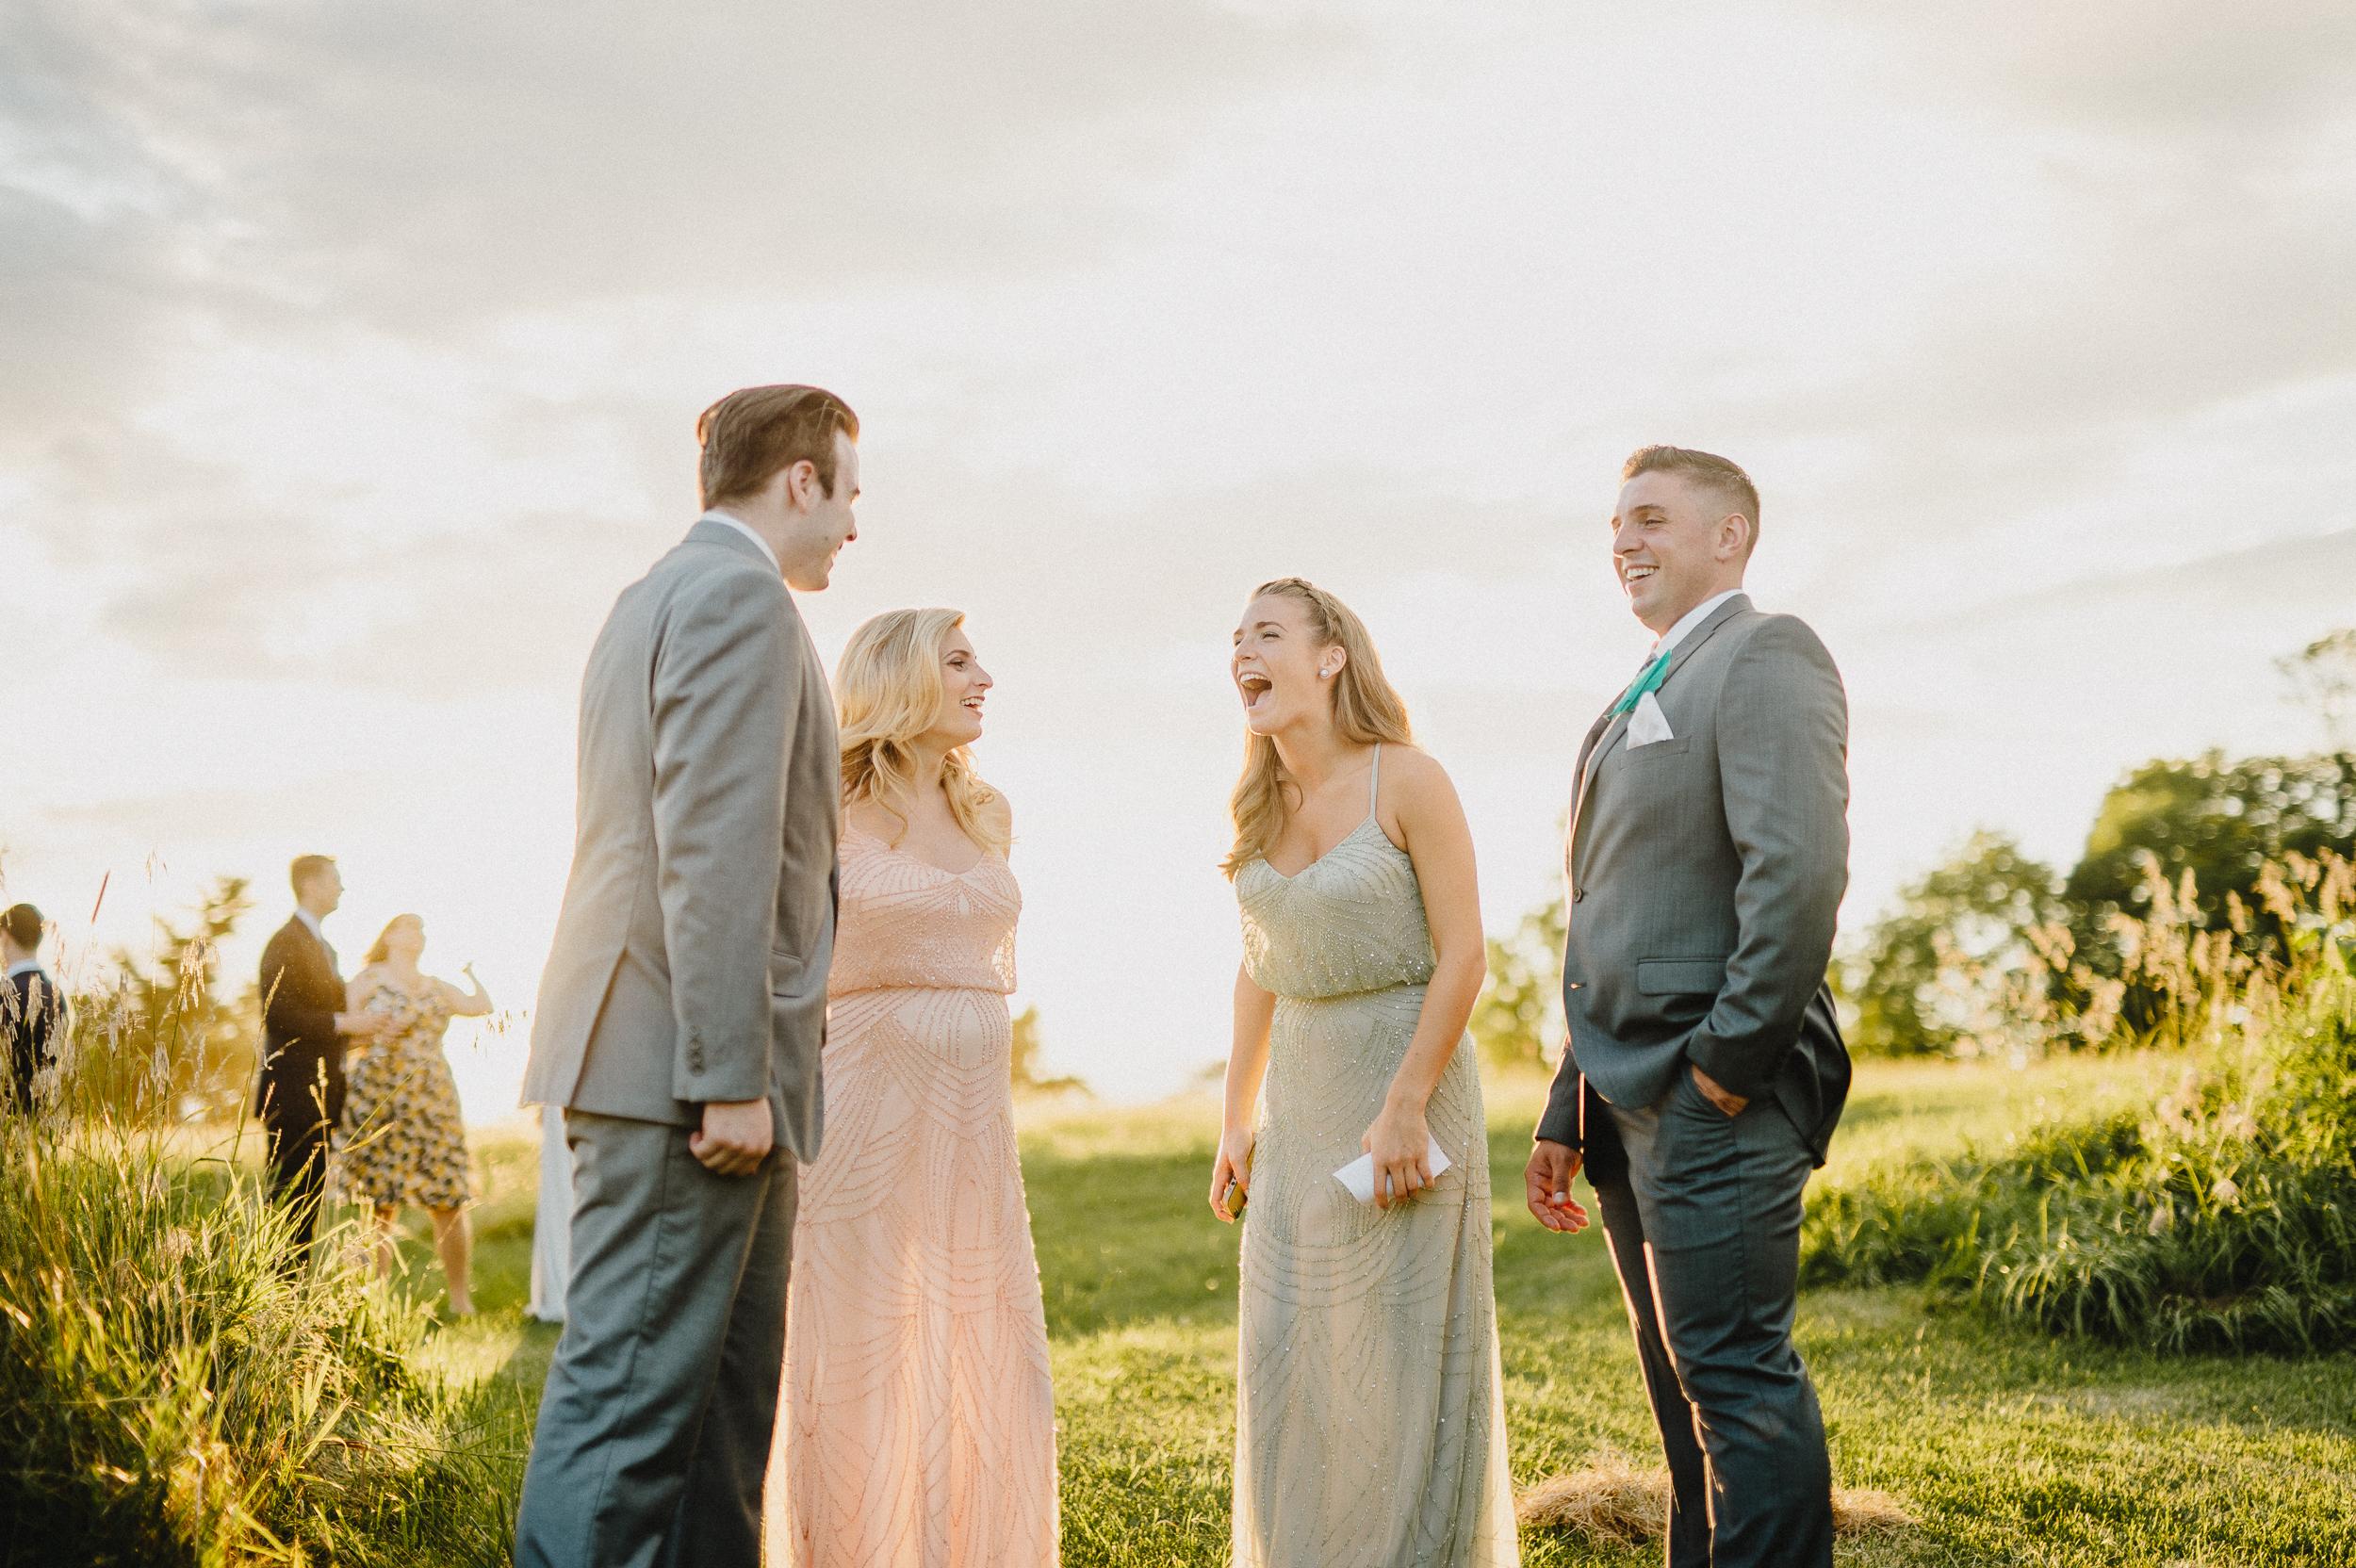 Pioneer-farms-warwick-new-york-wedding-photographer088.jpg